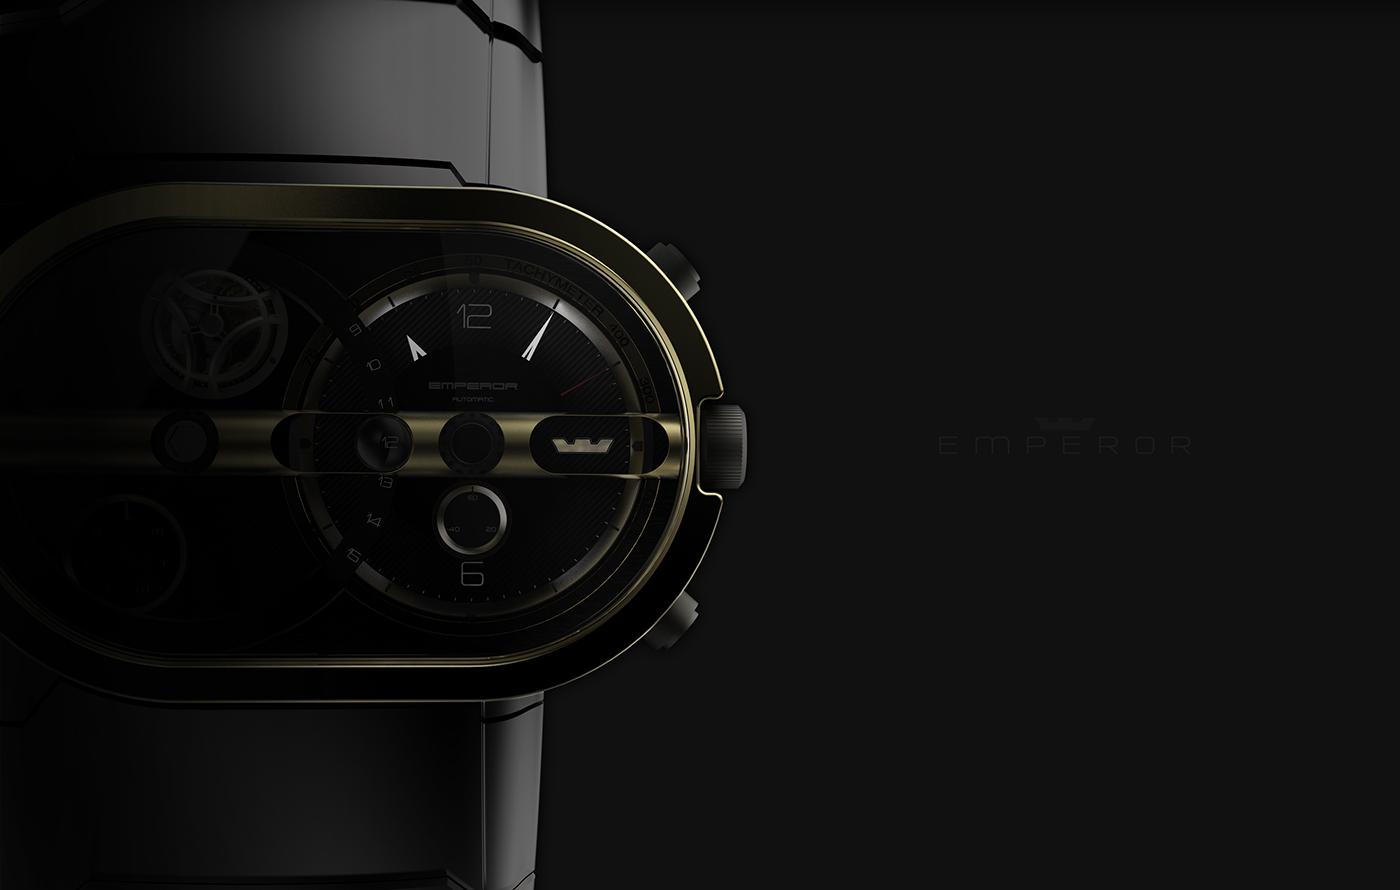 watch wristwatch automaticwatch automatic industrialdesign productdesign benelli KEEWAY motorcycle MotorcycleDesign tourbillon luxurywatch watchs horology timepiece